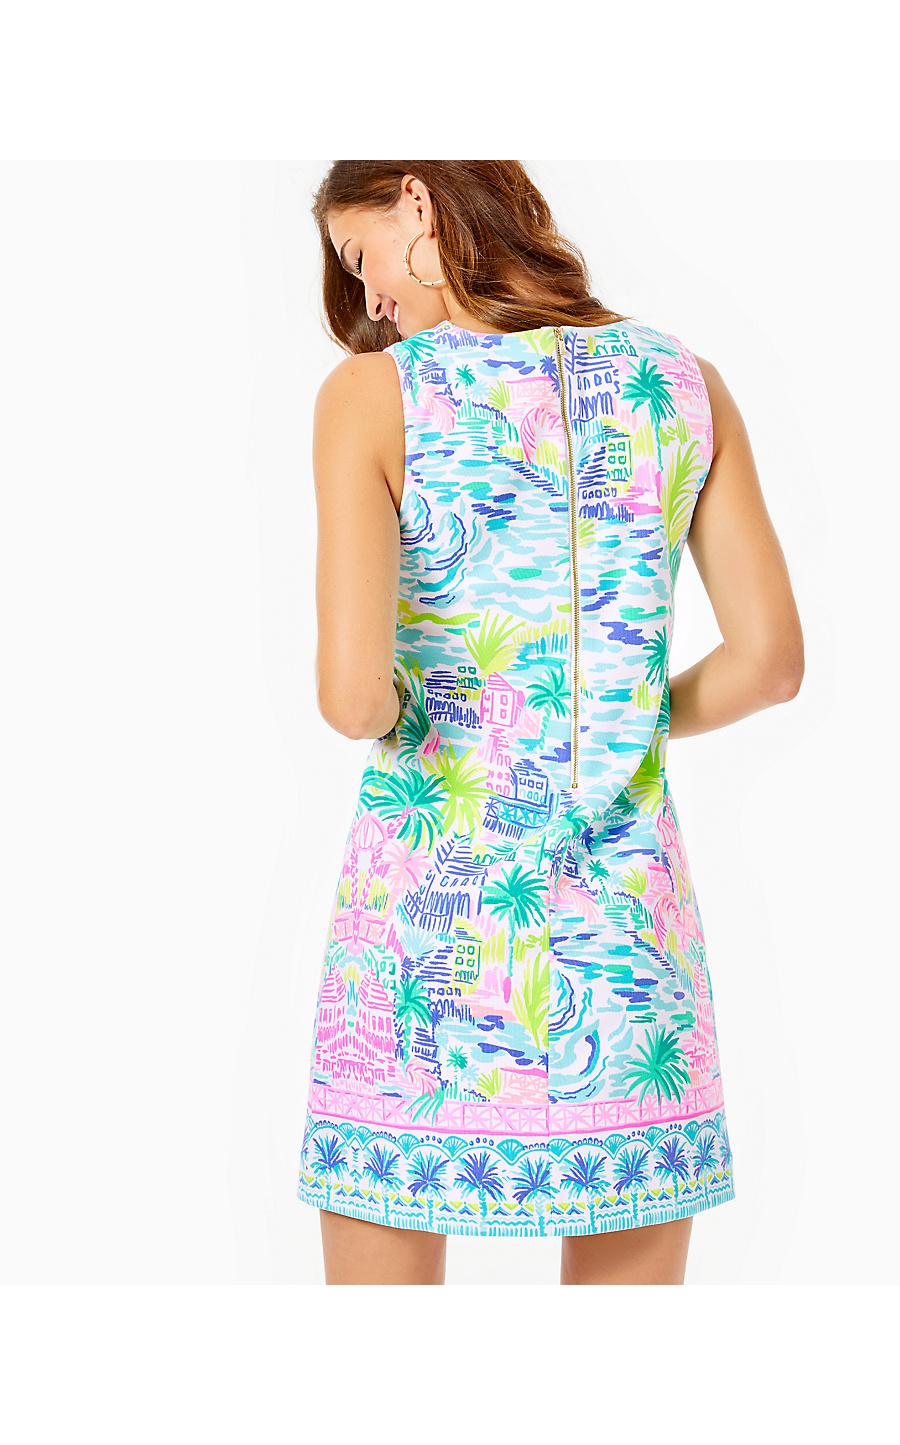 U20 005107 GELLAR SHIFT DRESS